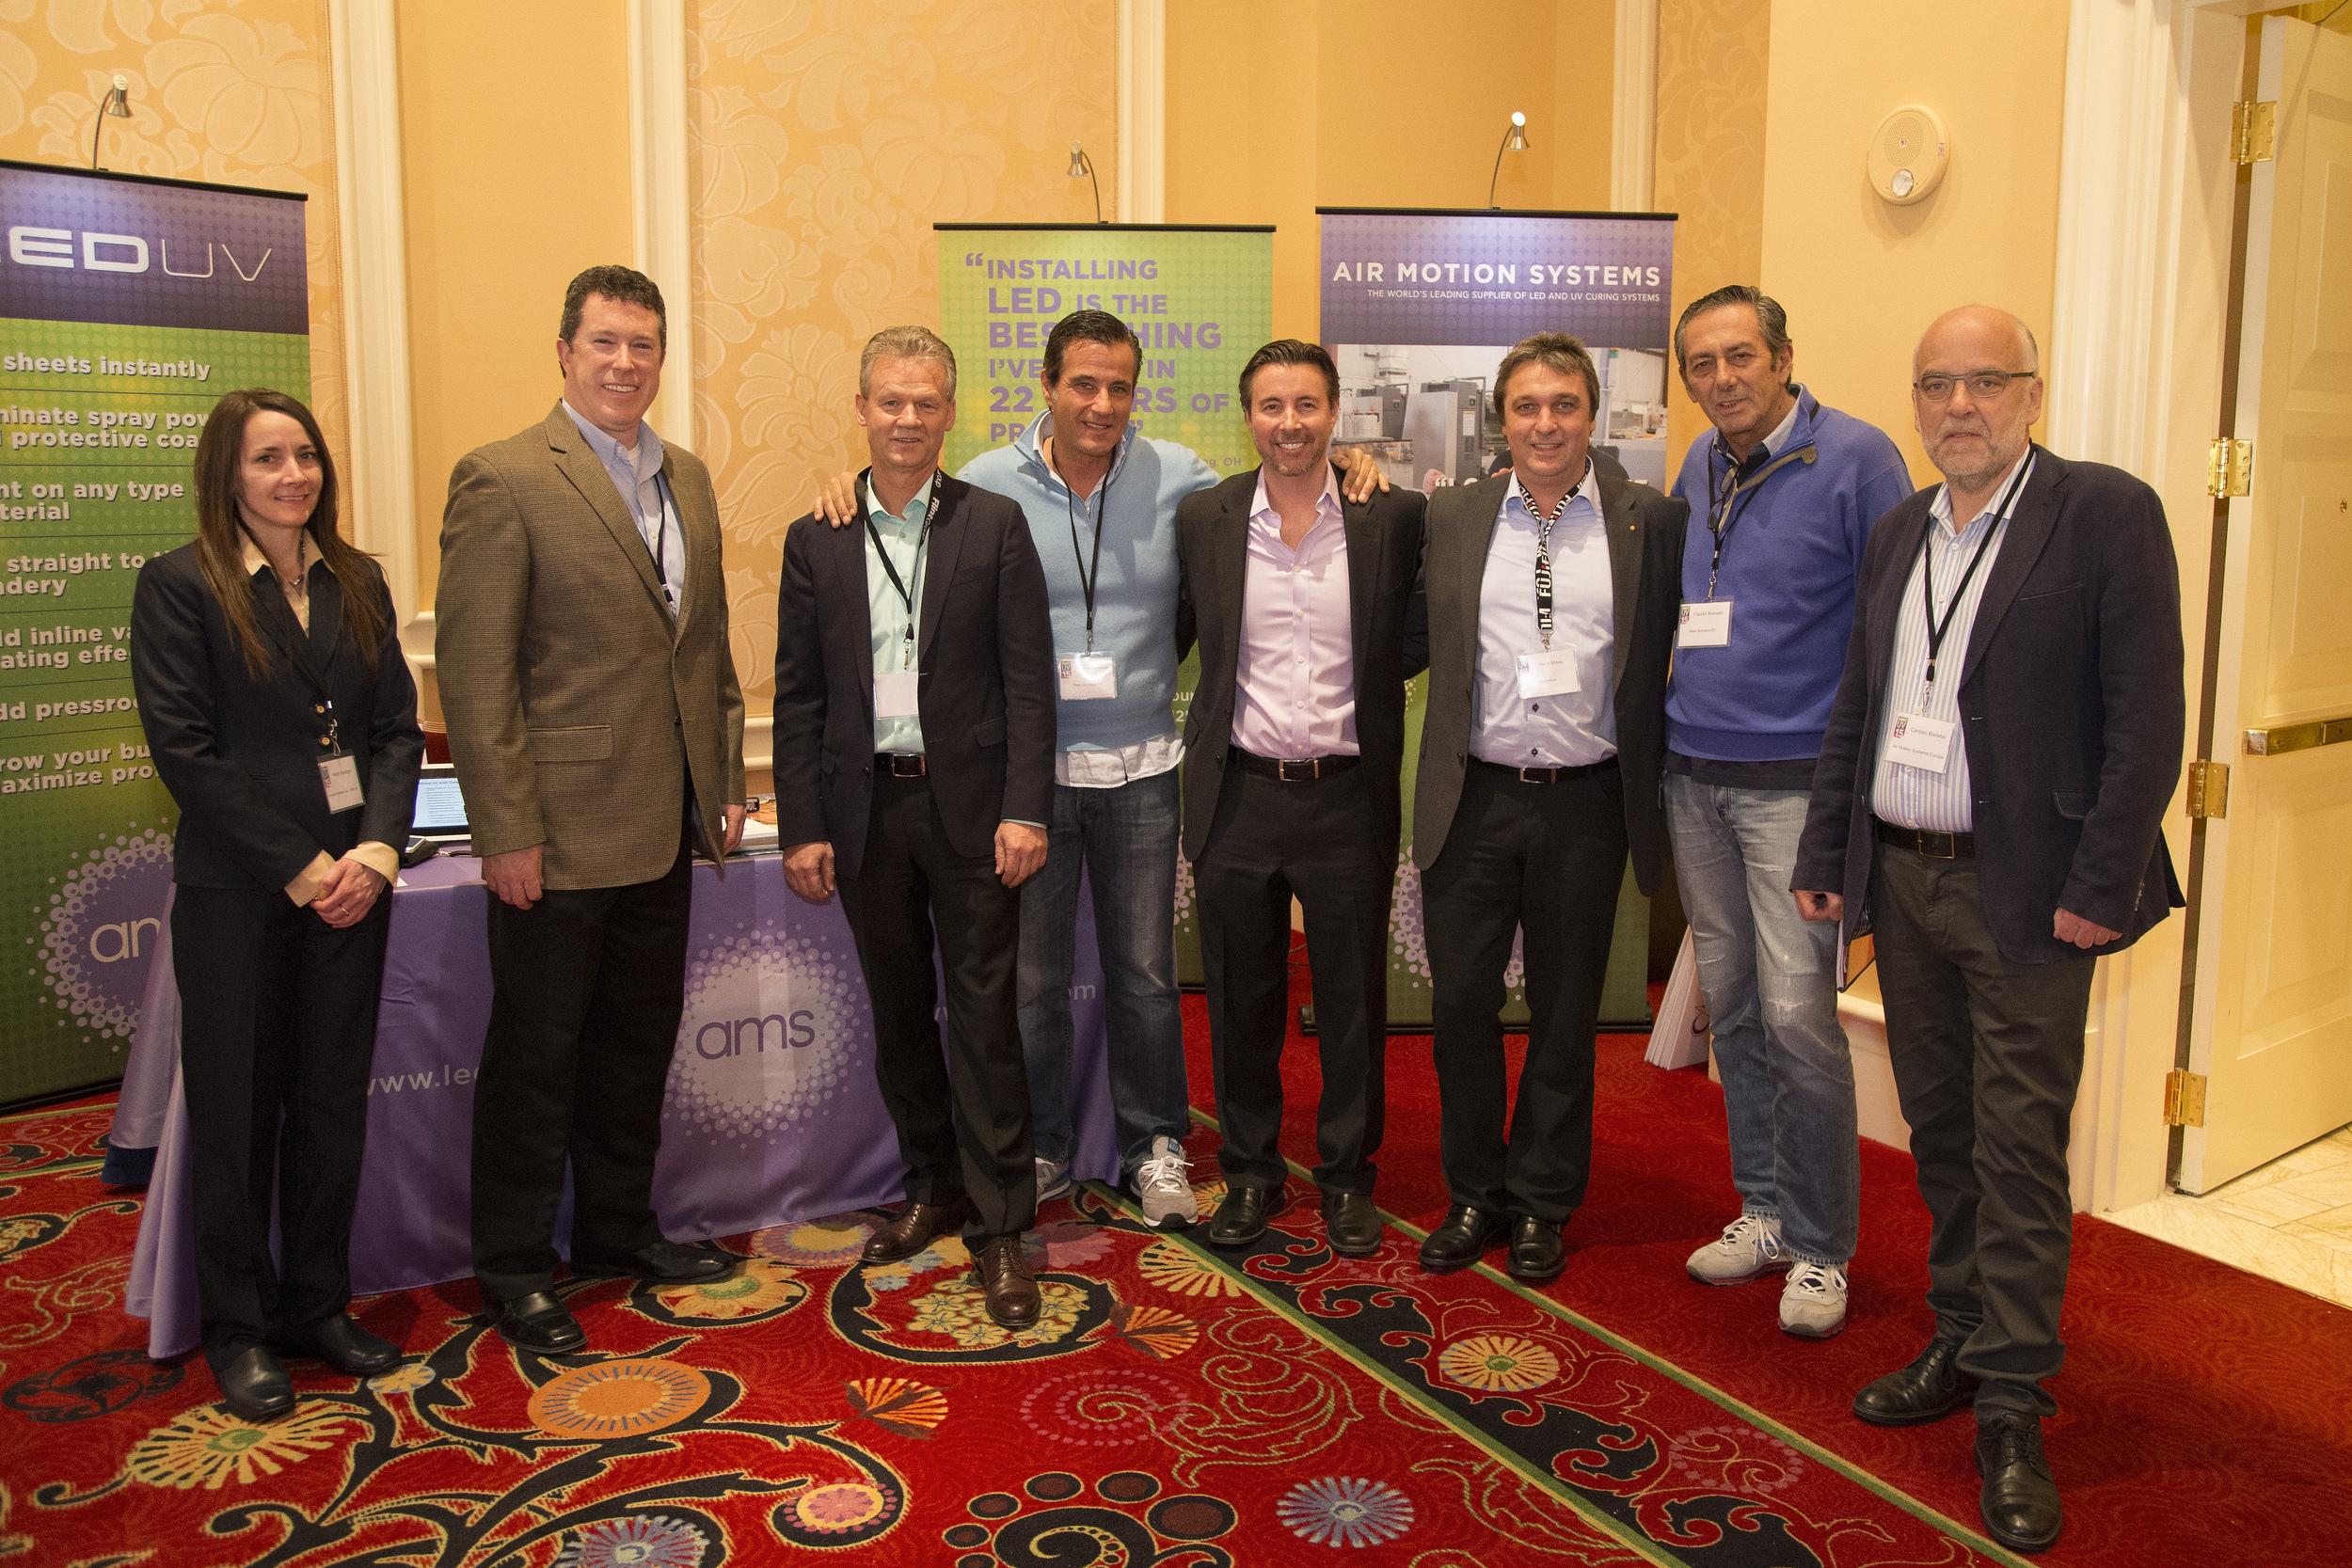 Platinum sponsor Air Motion Systems, Inc. (AMS) showcasing their sponsor table at Print UV 2015.